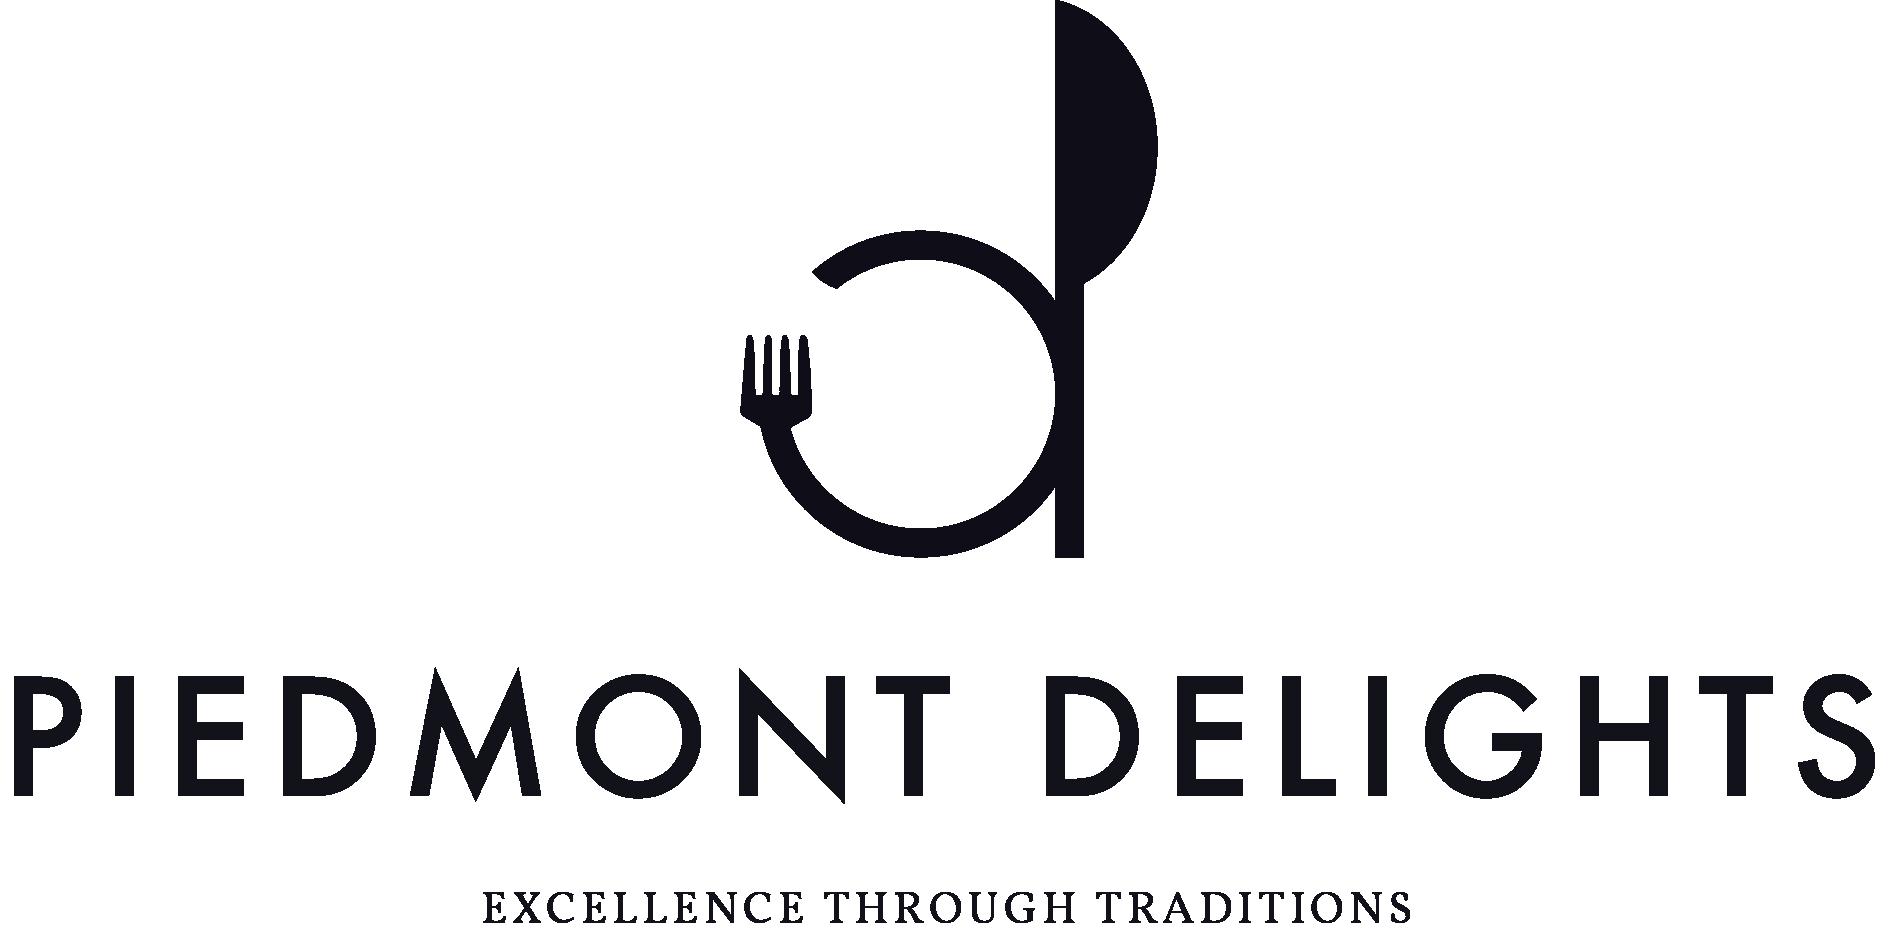 Piedmont Delights Logo